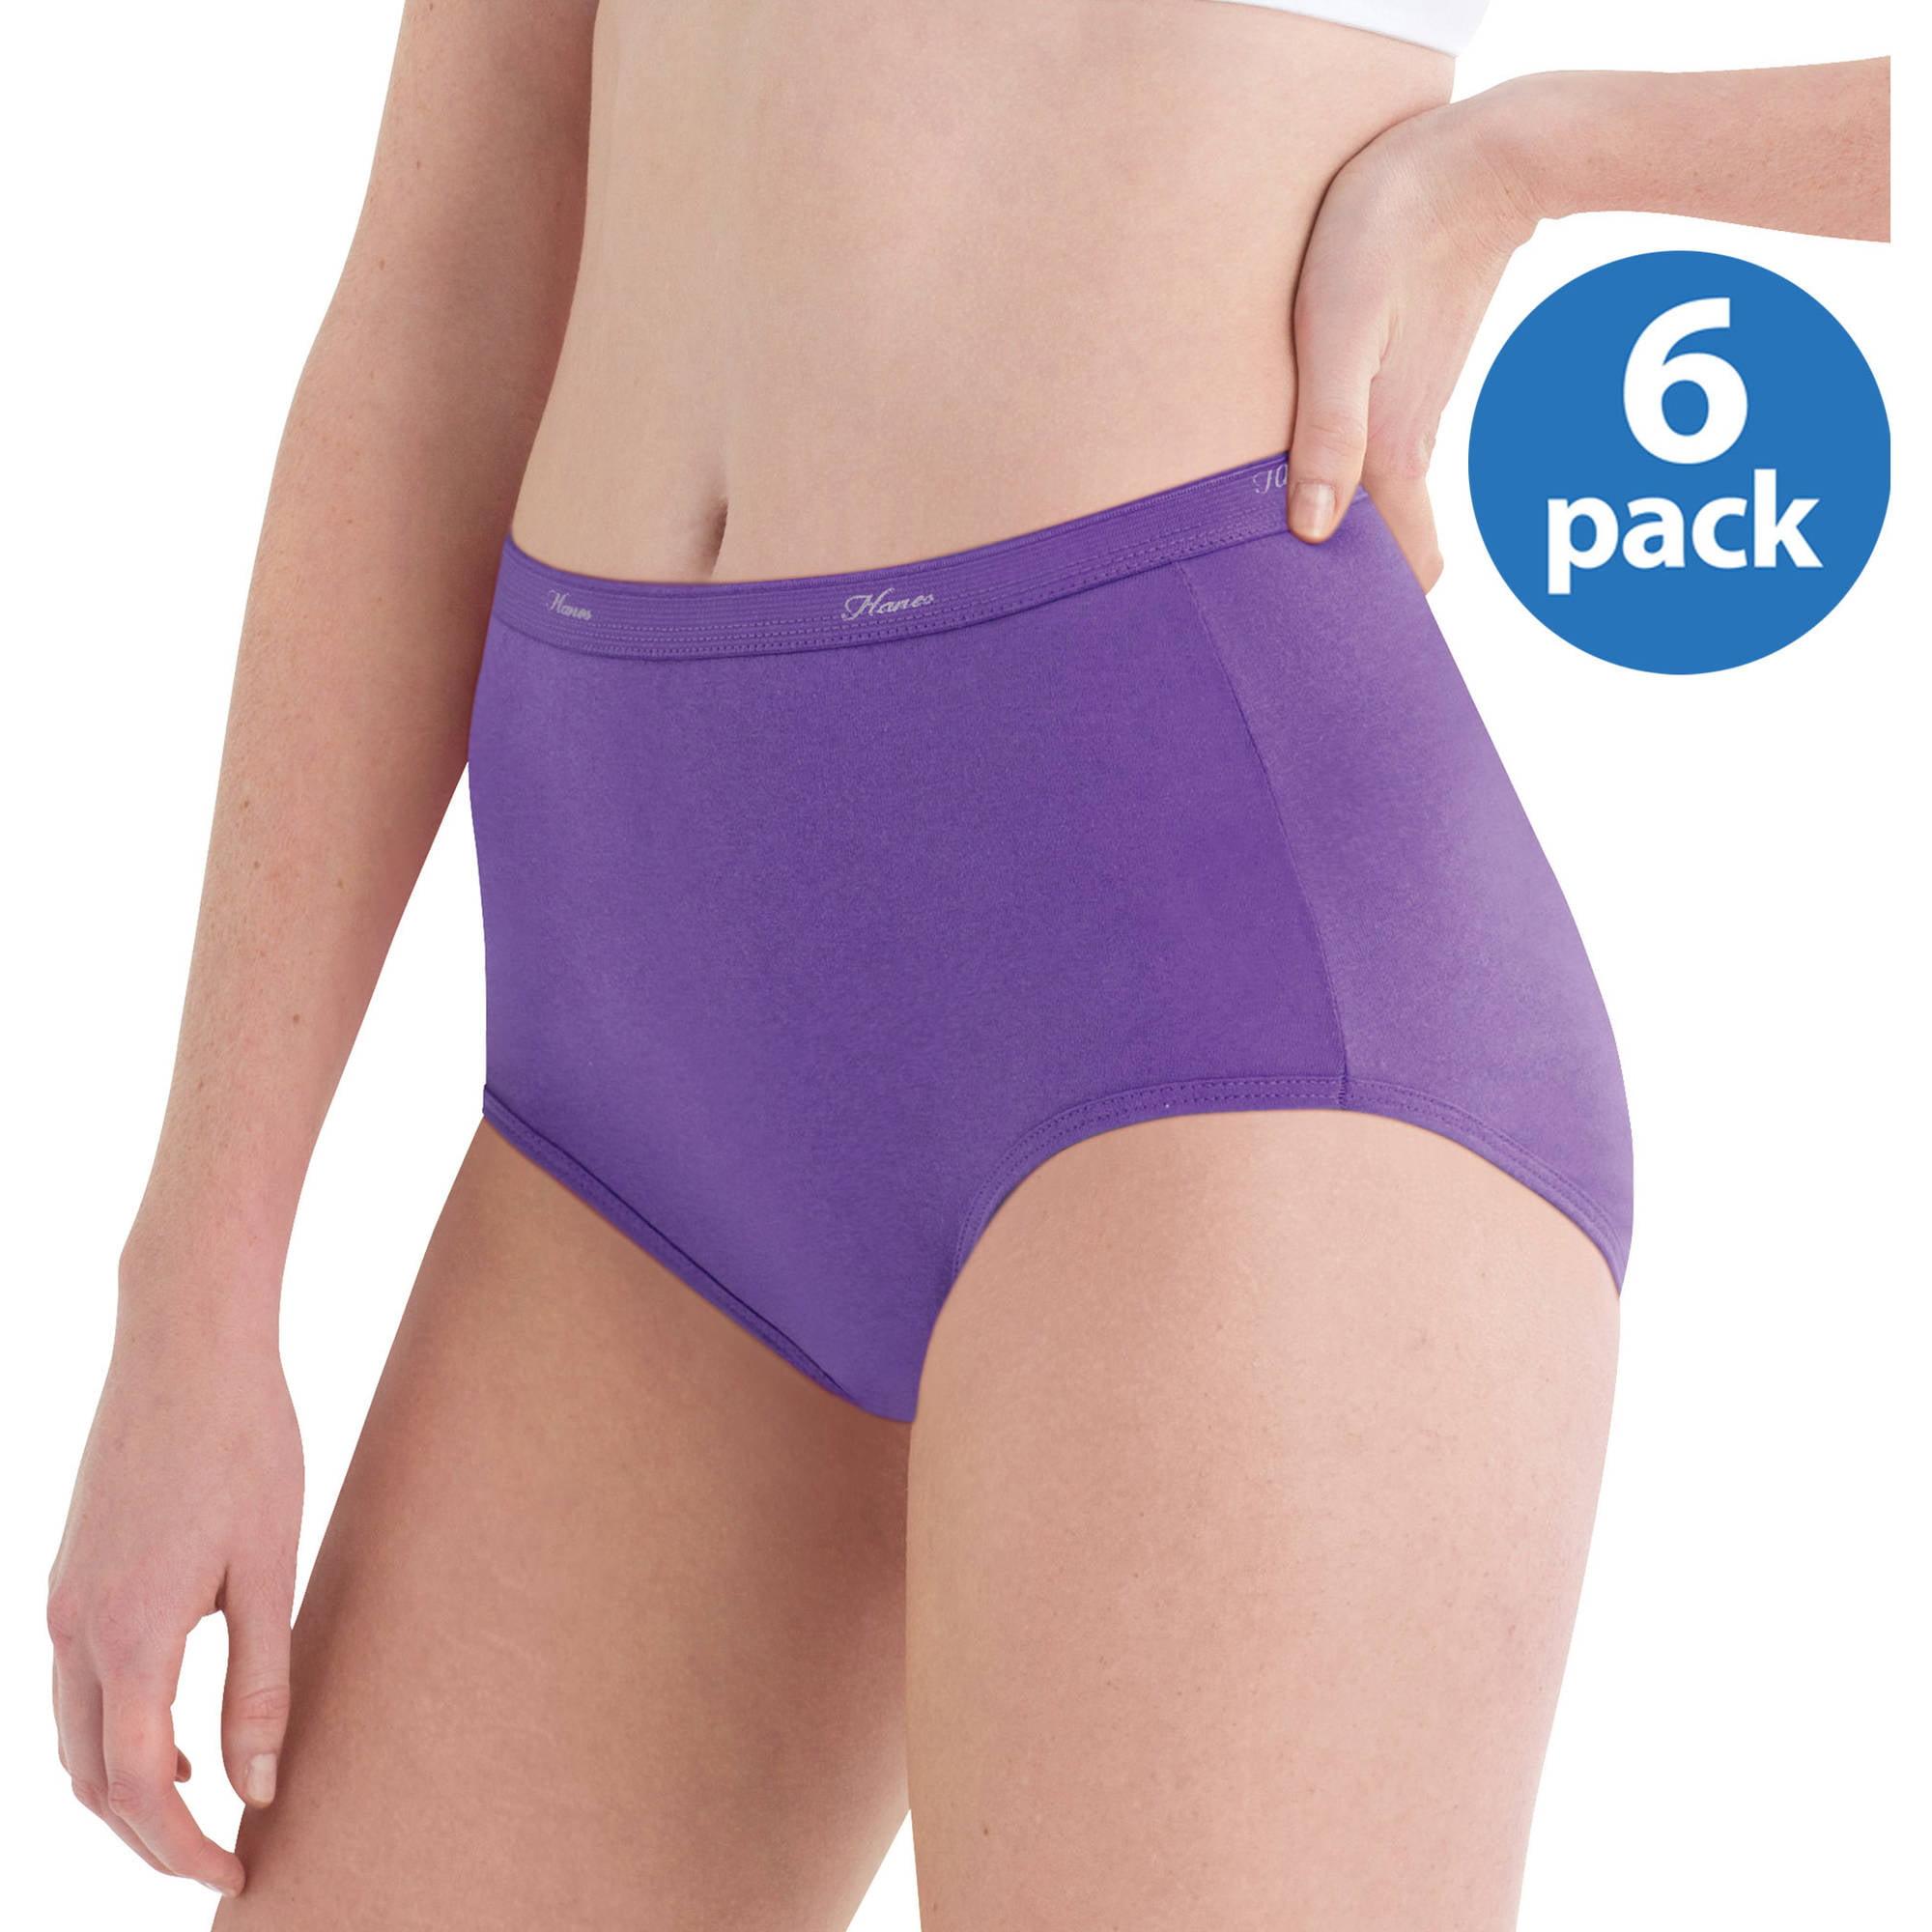 Hanes Women's LLC Cotton Brief Panties 6-Pack